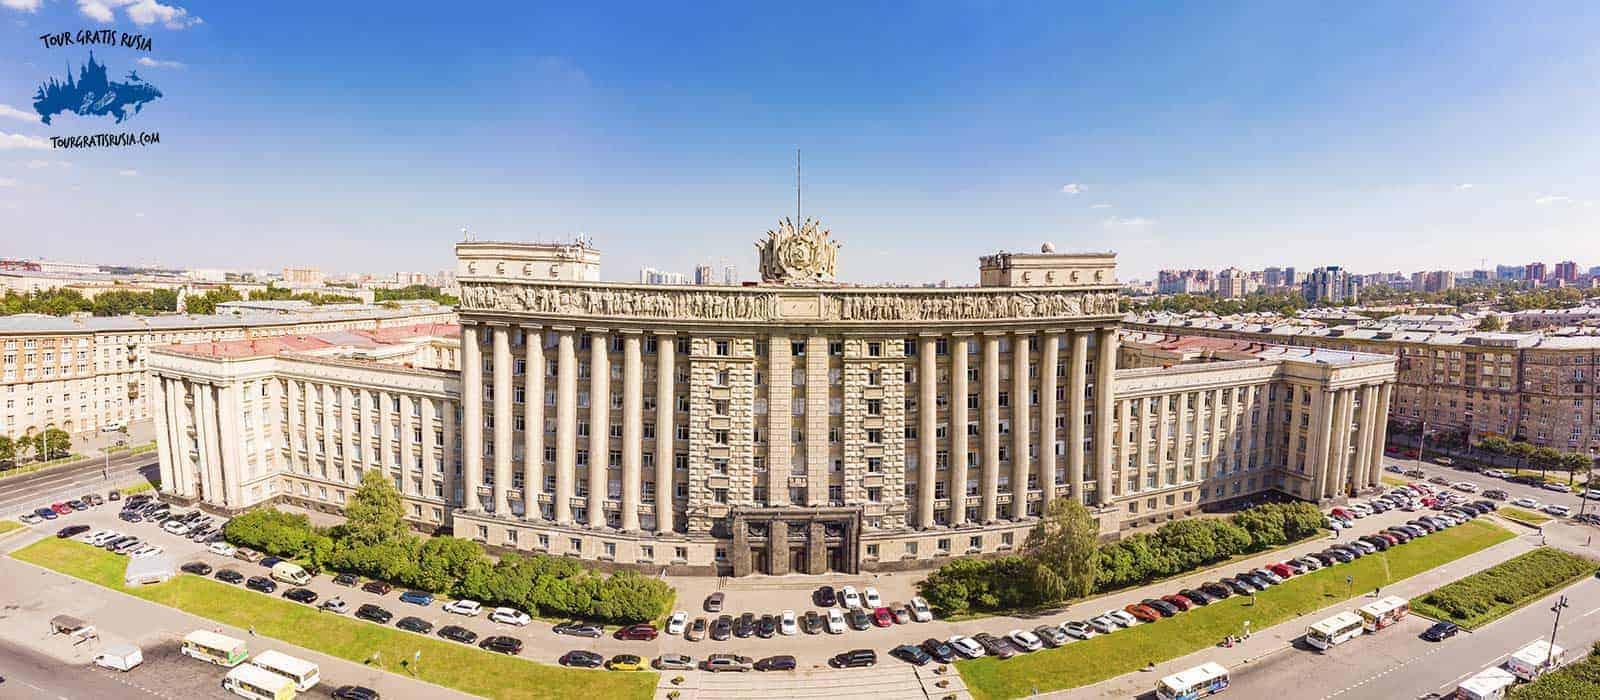 Tour en San Petersburgo día completo: centro, metro, tour soviético y paseo nocturno